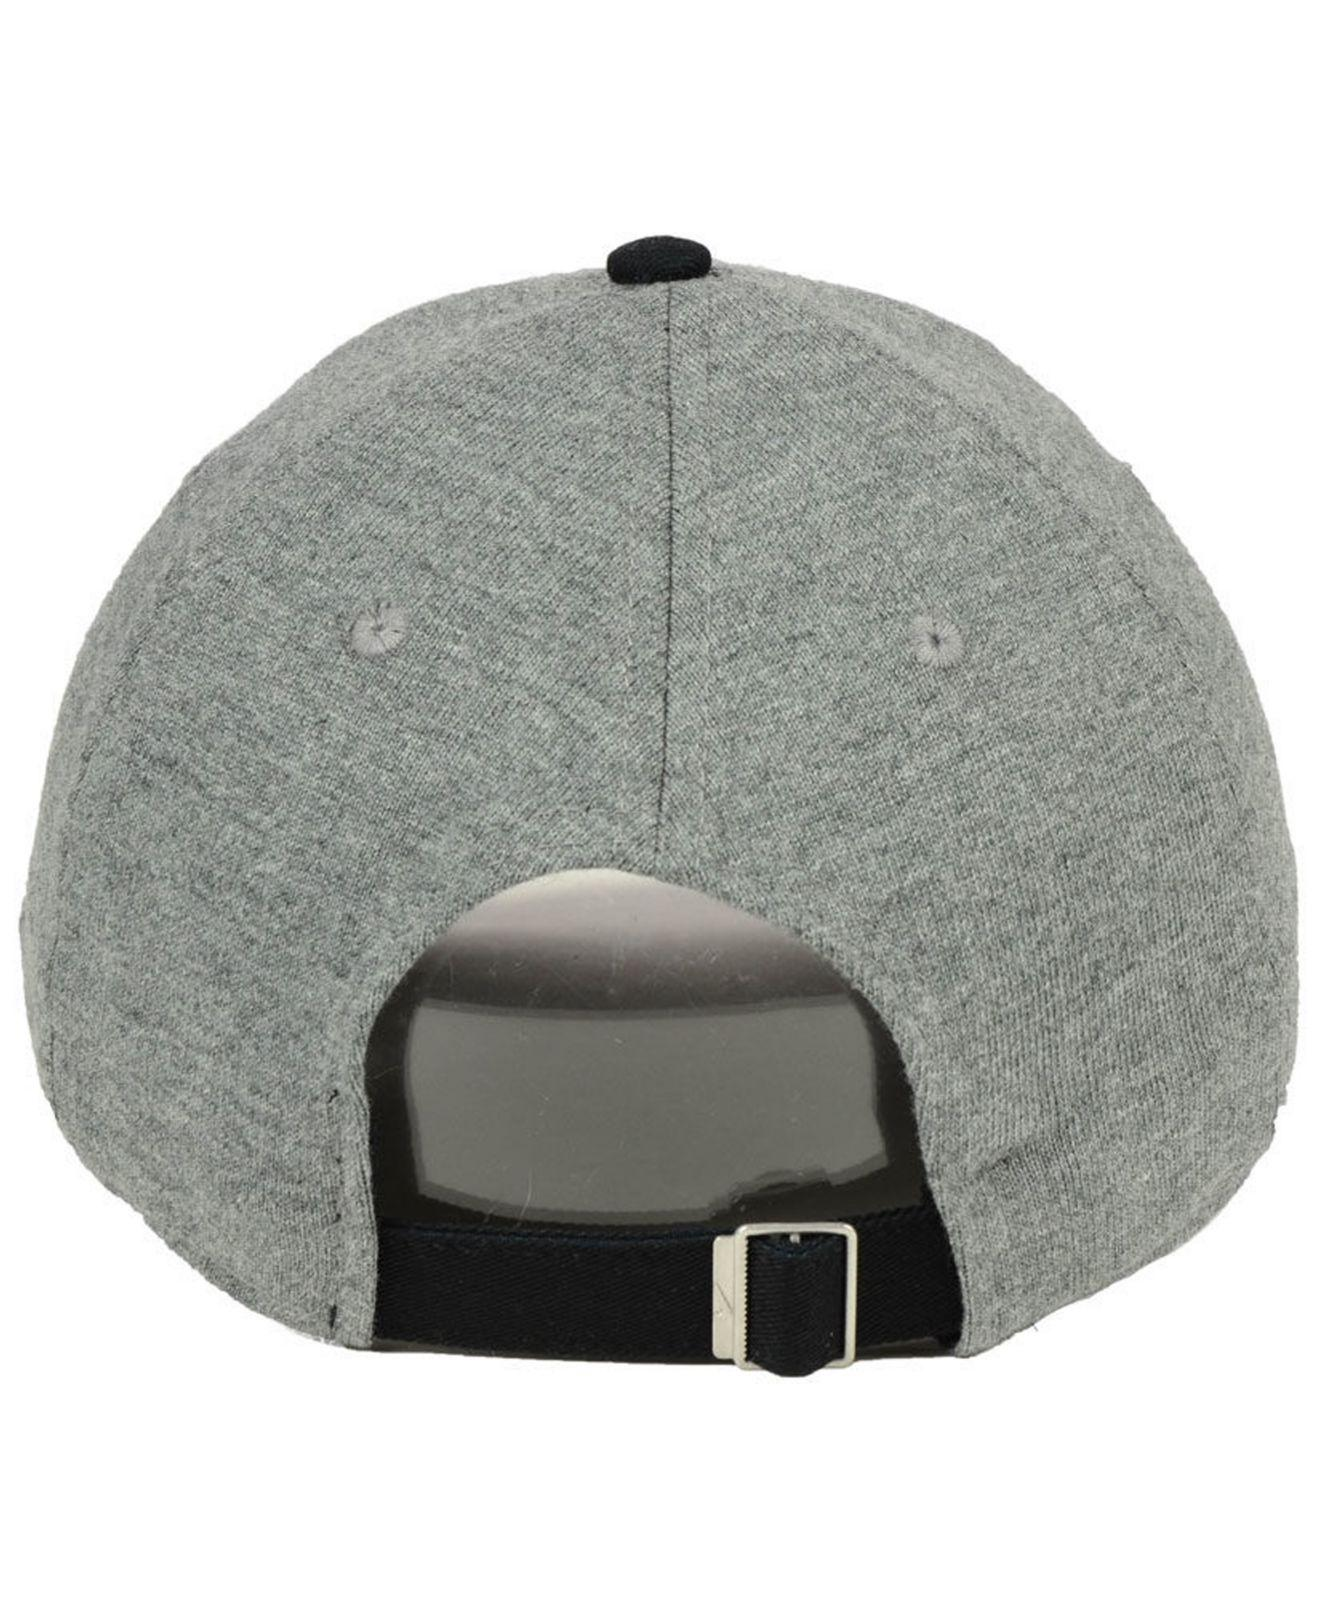 new product c13e2 85ae5 ... australia nike gray chicago white sox 2 tone heather cap for men lyst. view  fullscreen